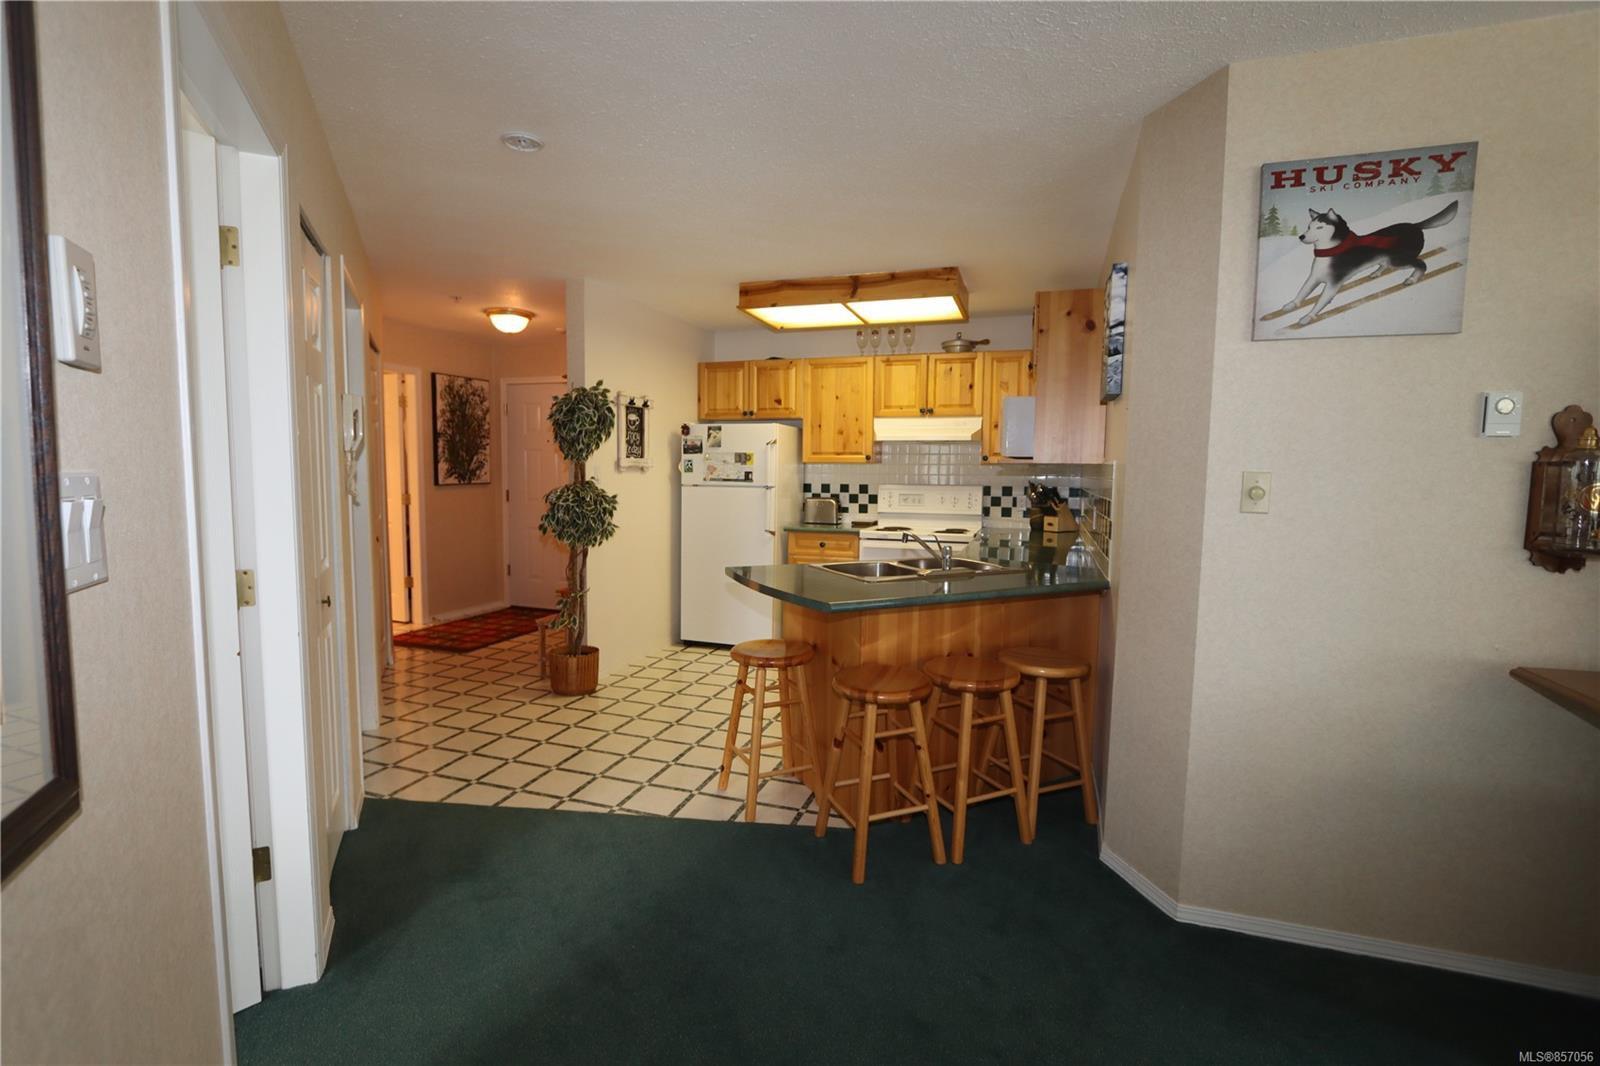 Photo 3: Photos: 118 1320 Henry Rd in : CV Mt Washington Condo for sale (Comox Valley)  : MLS®# 857056